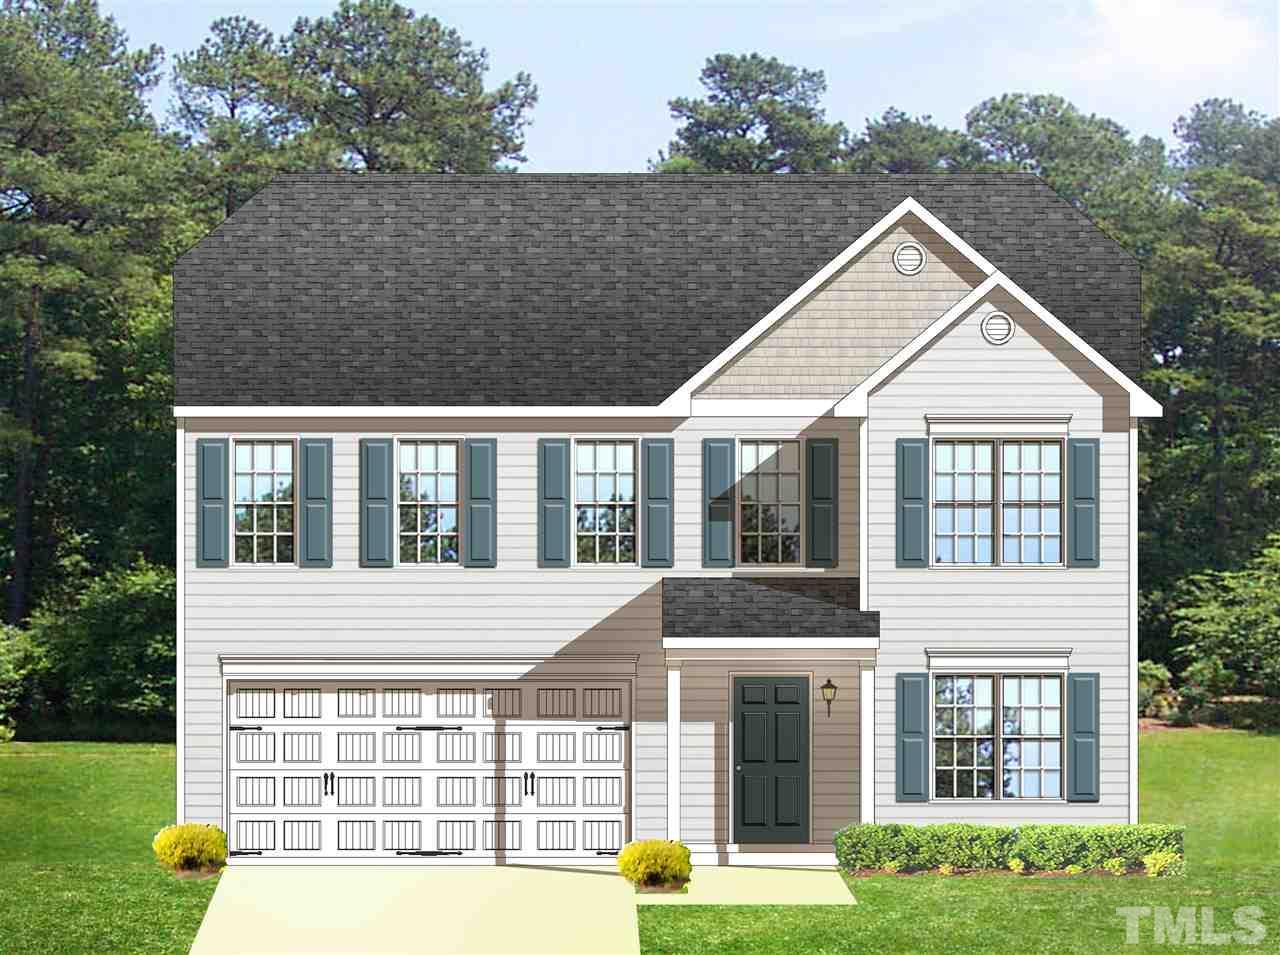 162 MEADOW HILLS Drive 22, Four Oaks, NC 27524